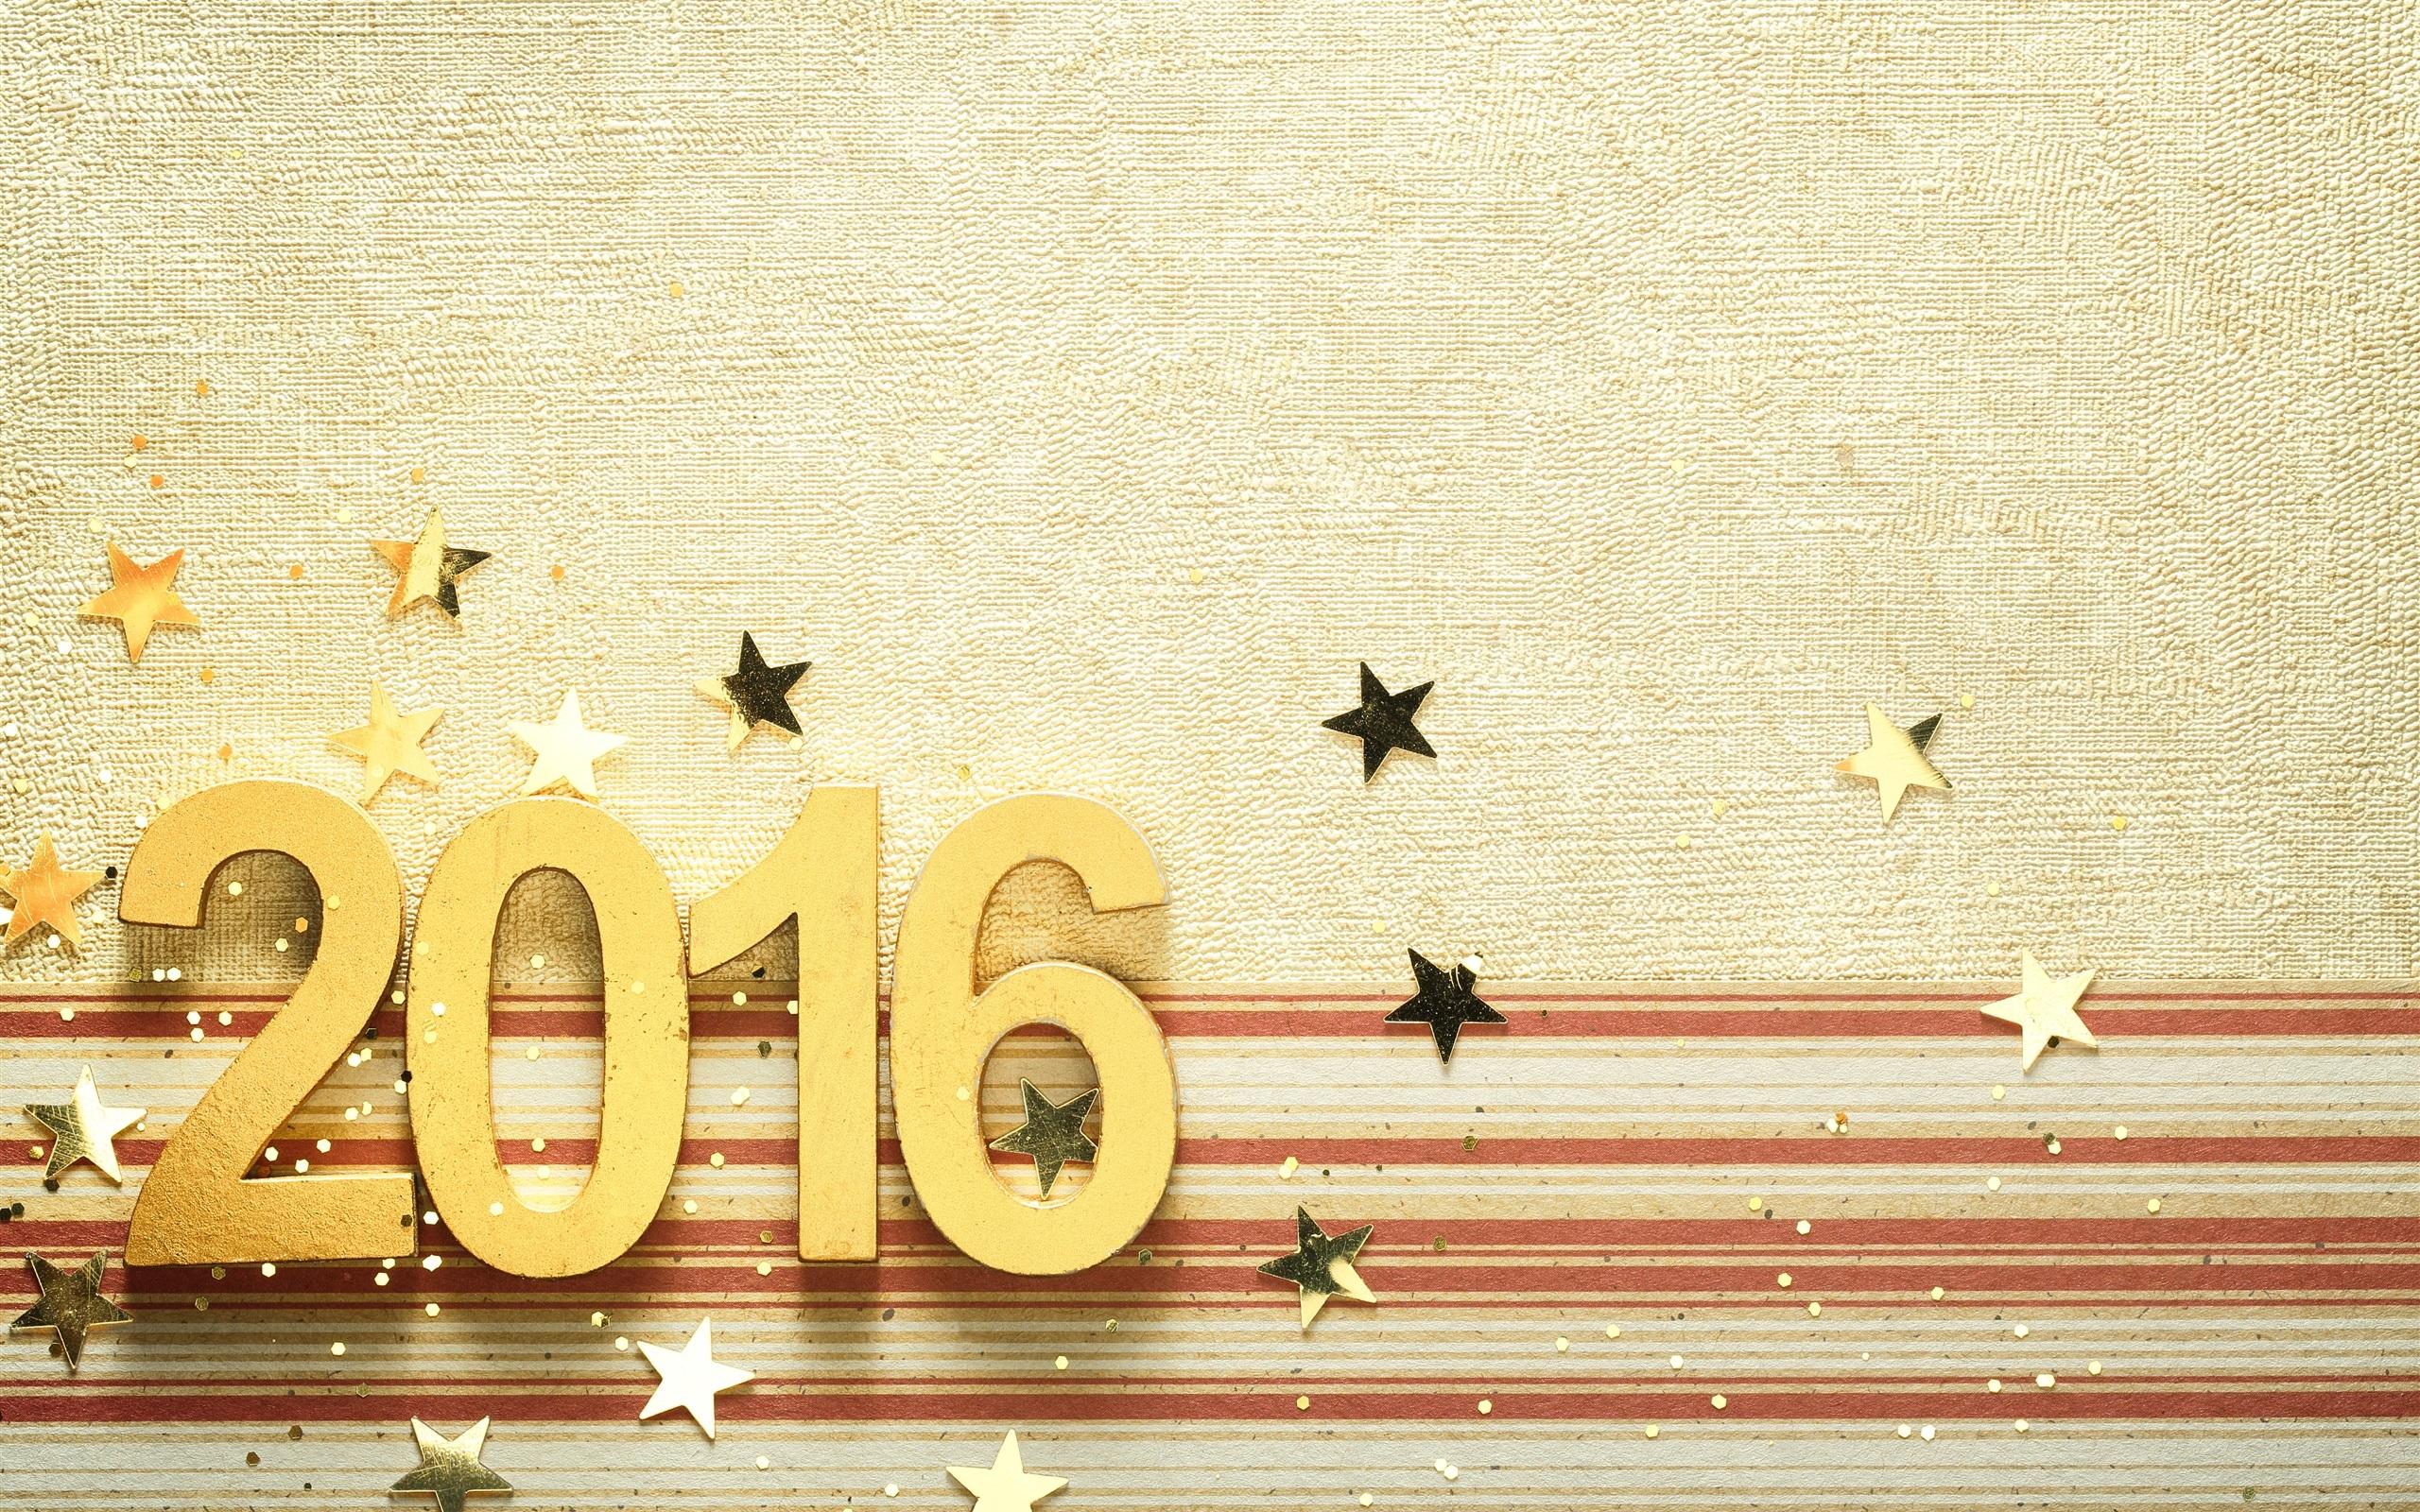 New Best Wallpapers 2016: 배경 화면 2016 해피 뉴 이어, 황금, 숫자, 별 2560x1600 HD 그림, 이미지